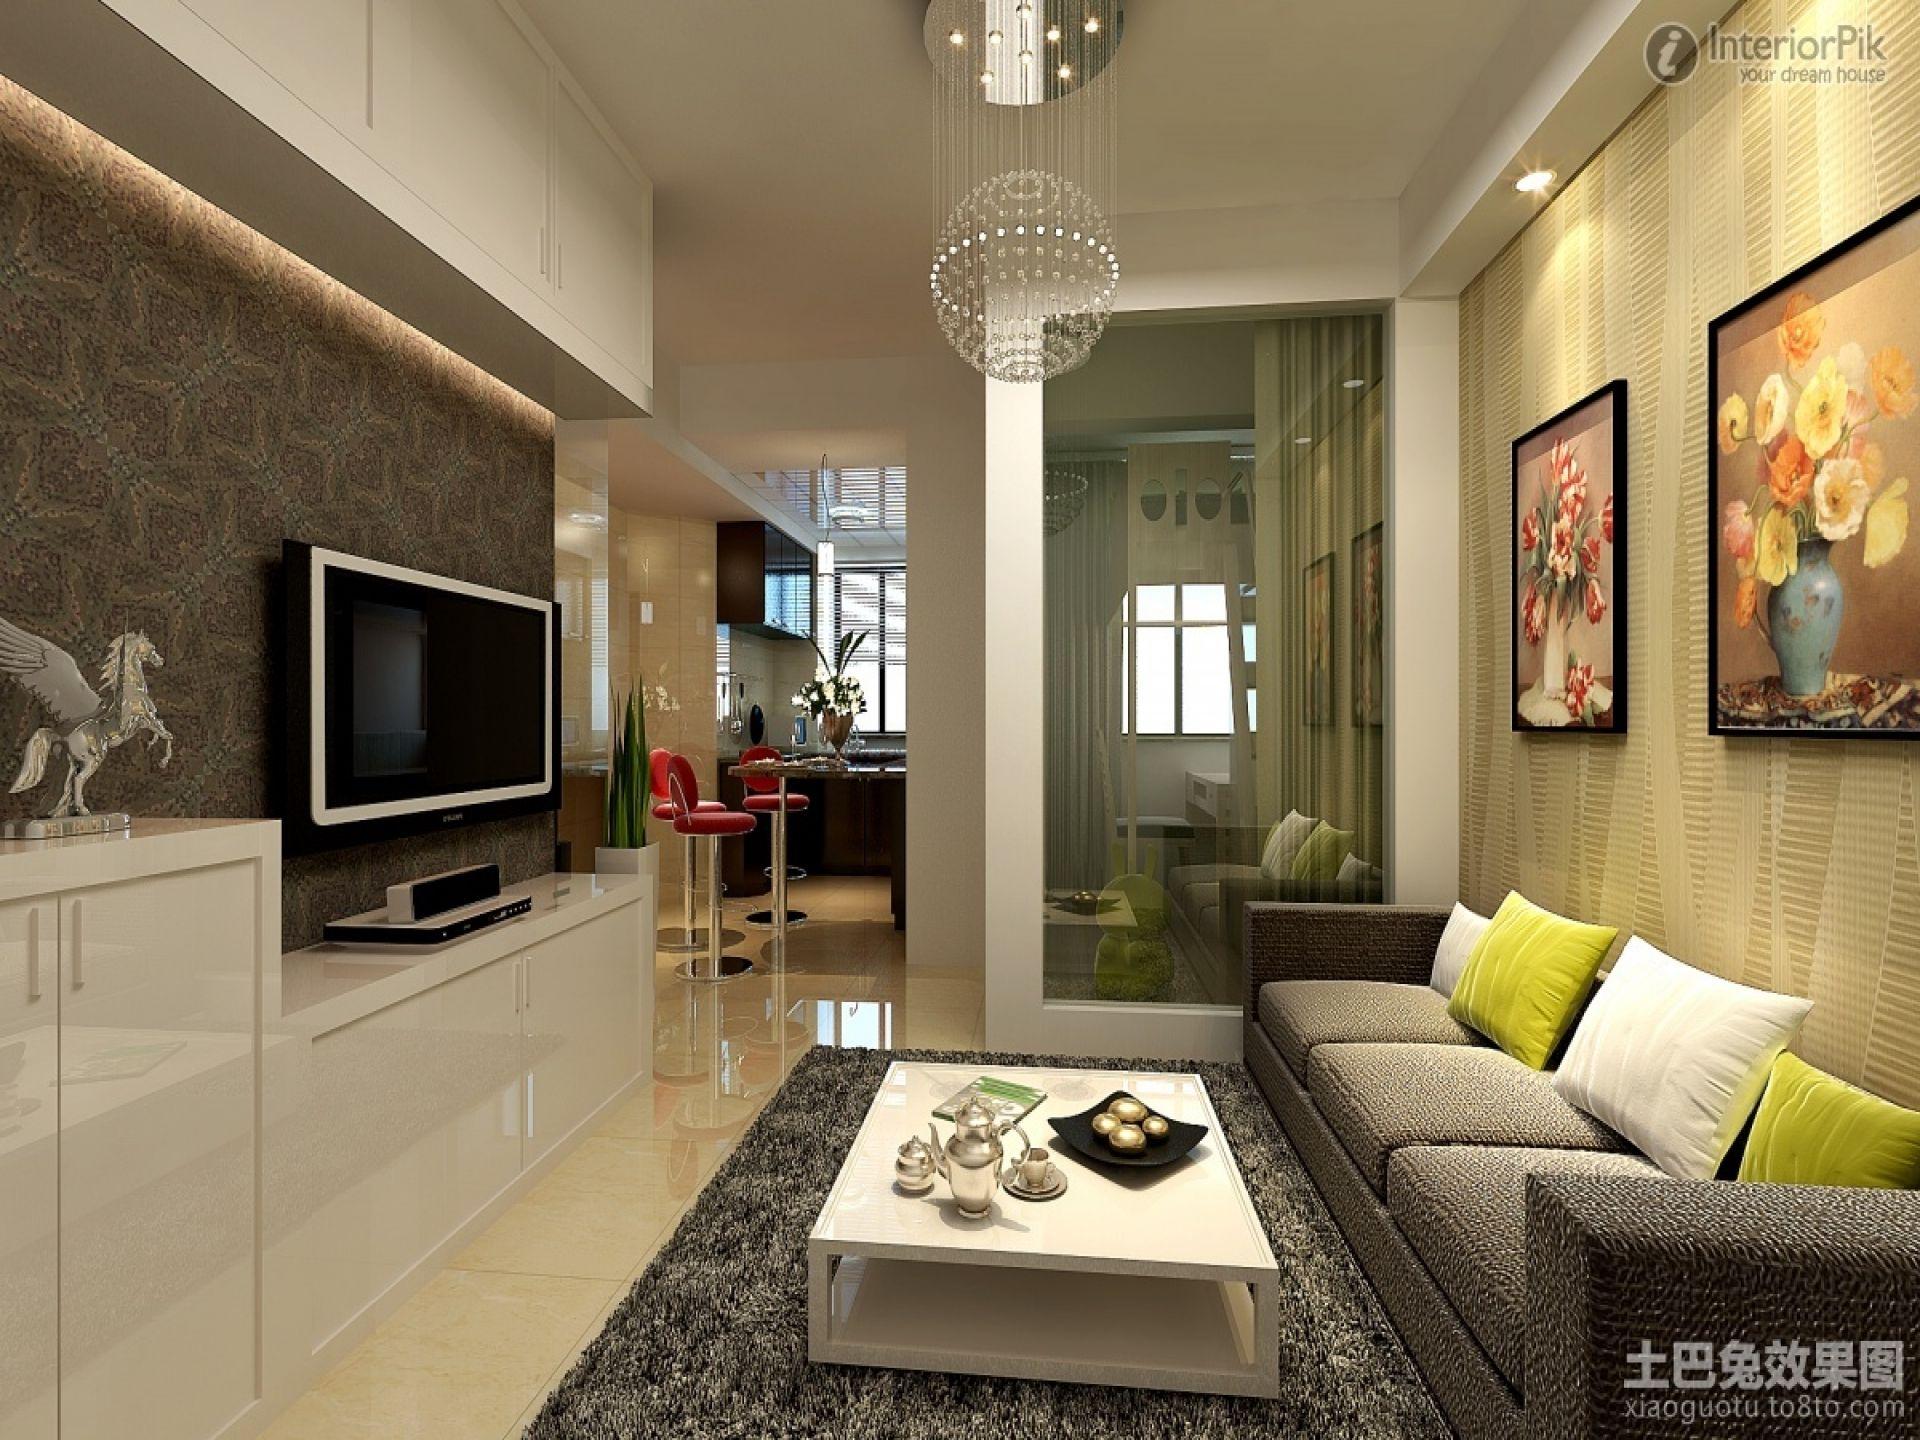 apartment living room | Modern Rental Apartment Living Room ...